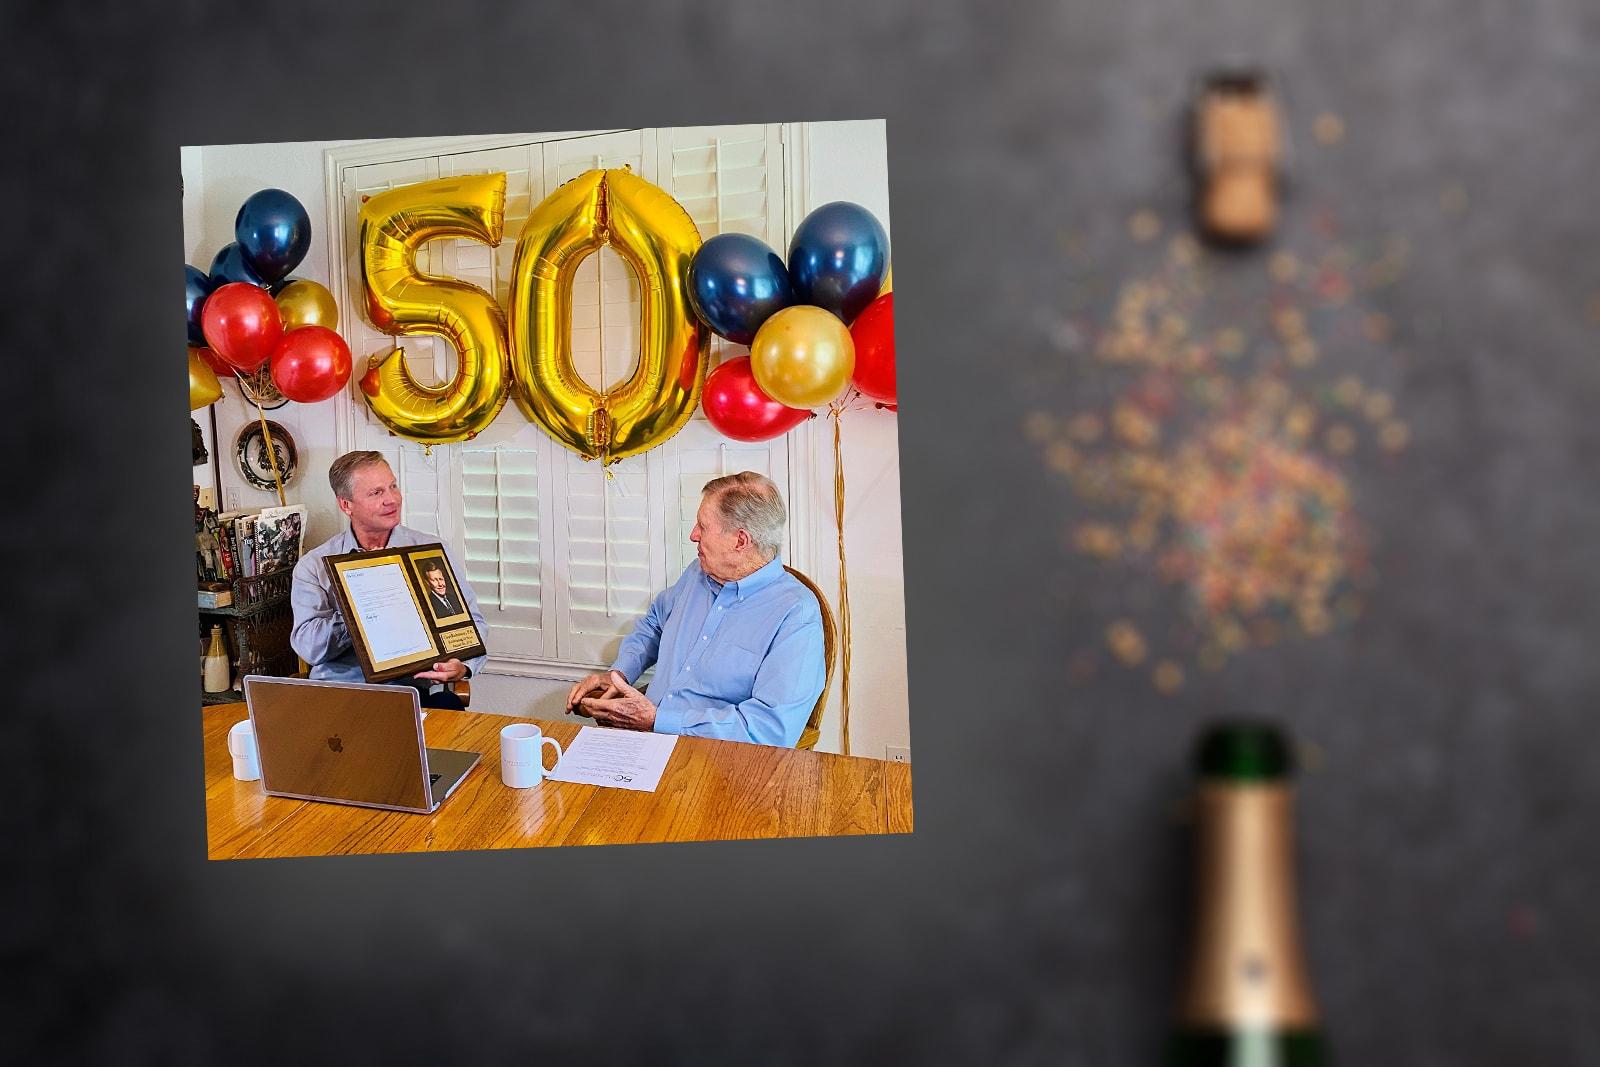 Celebration-Dean-Cannon-50th-anniversary.jpg